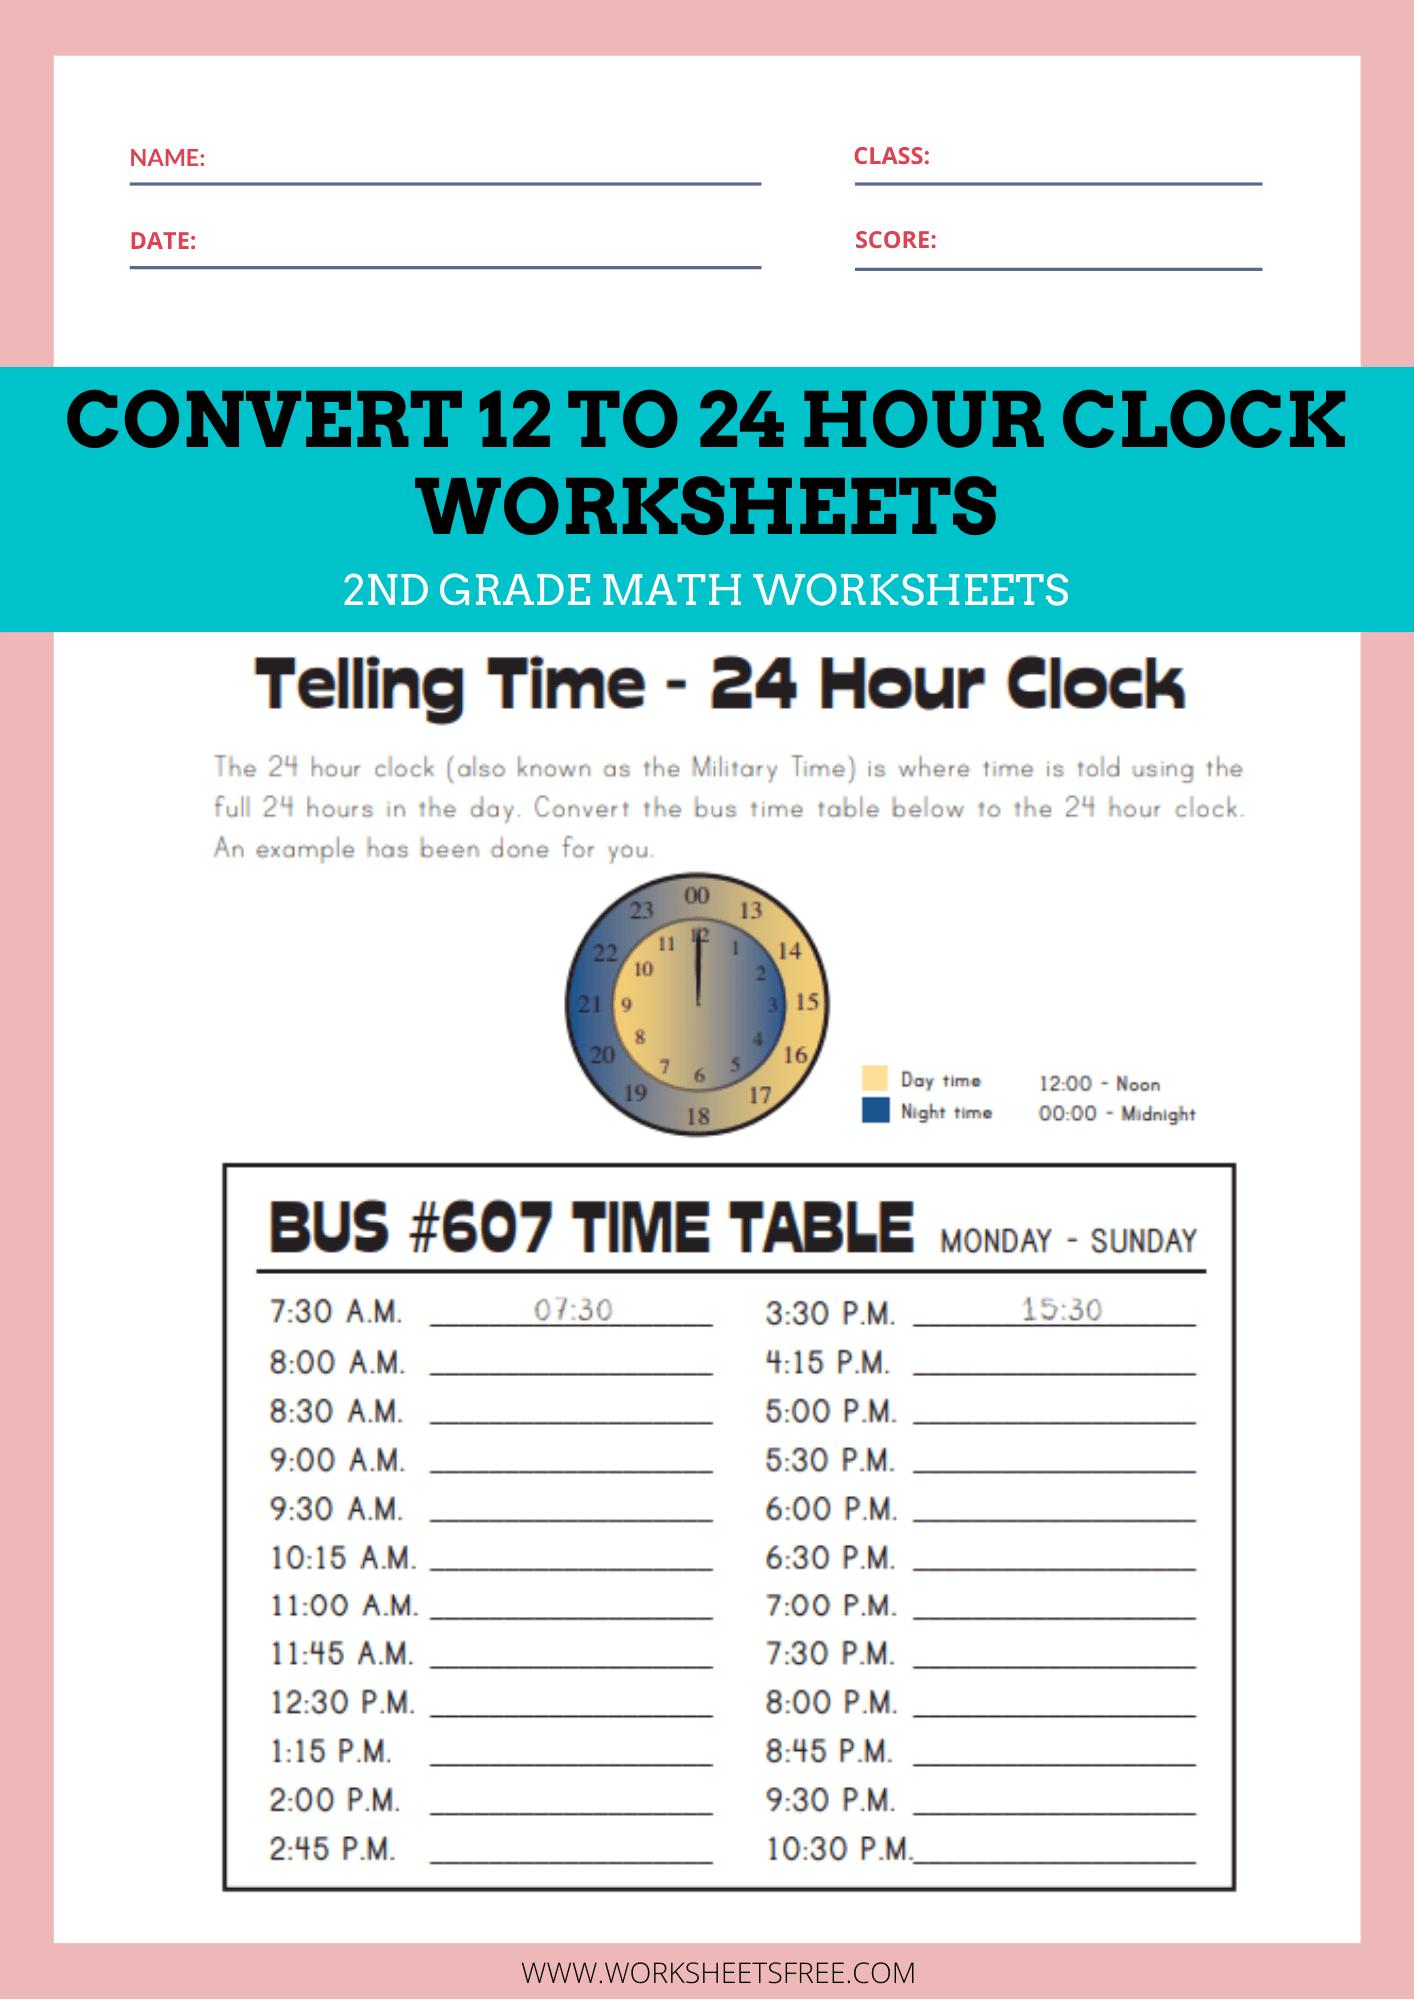 medium resolution of Convert-12-to-24-Hour-Clock-Worksheets   Worksheets Free